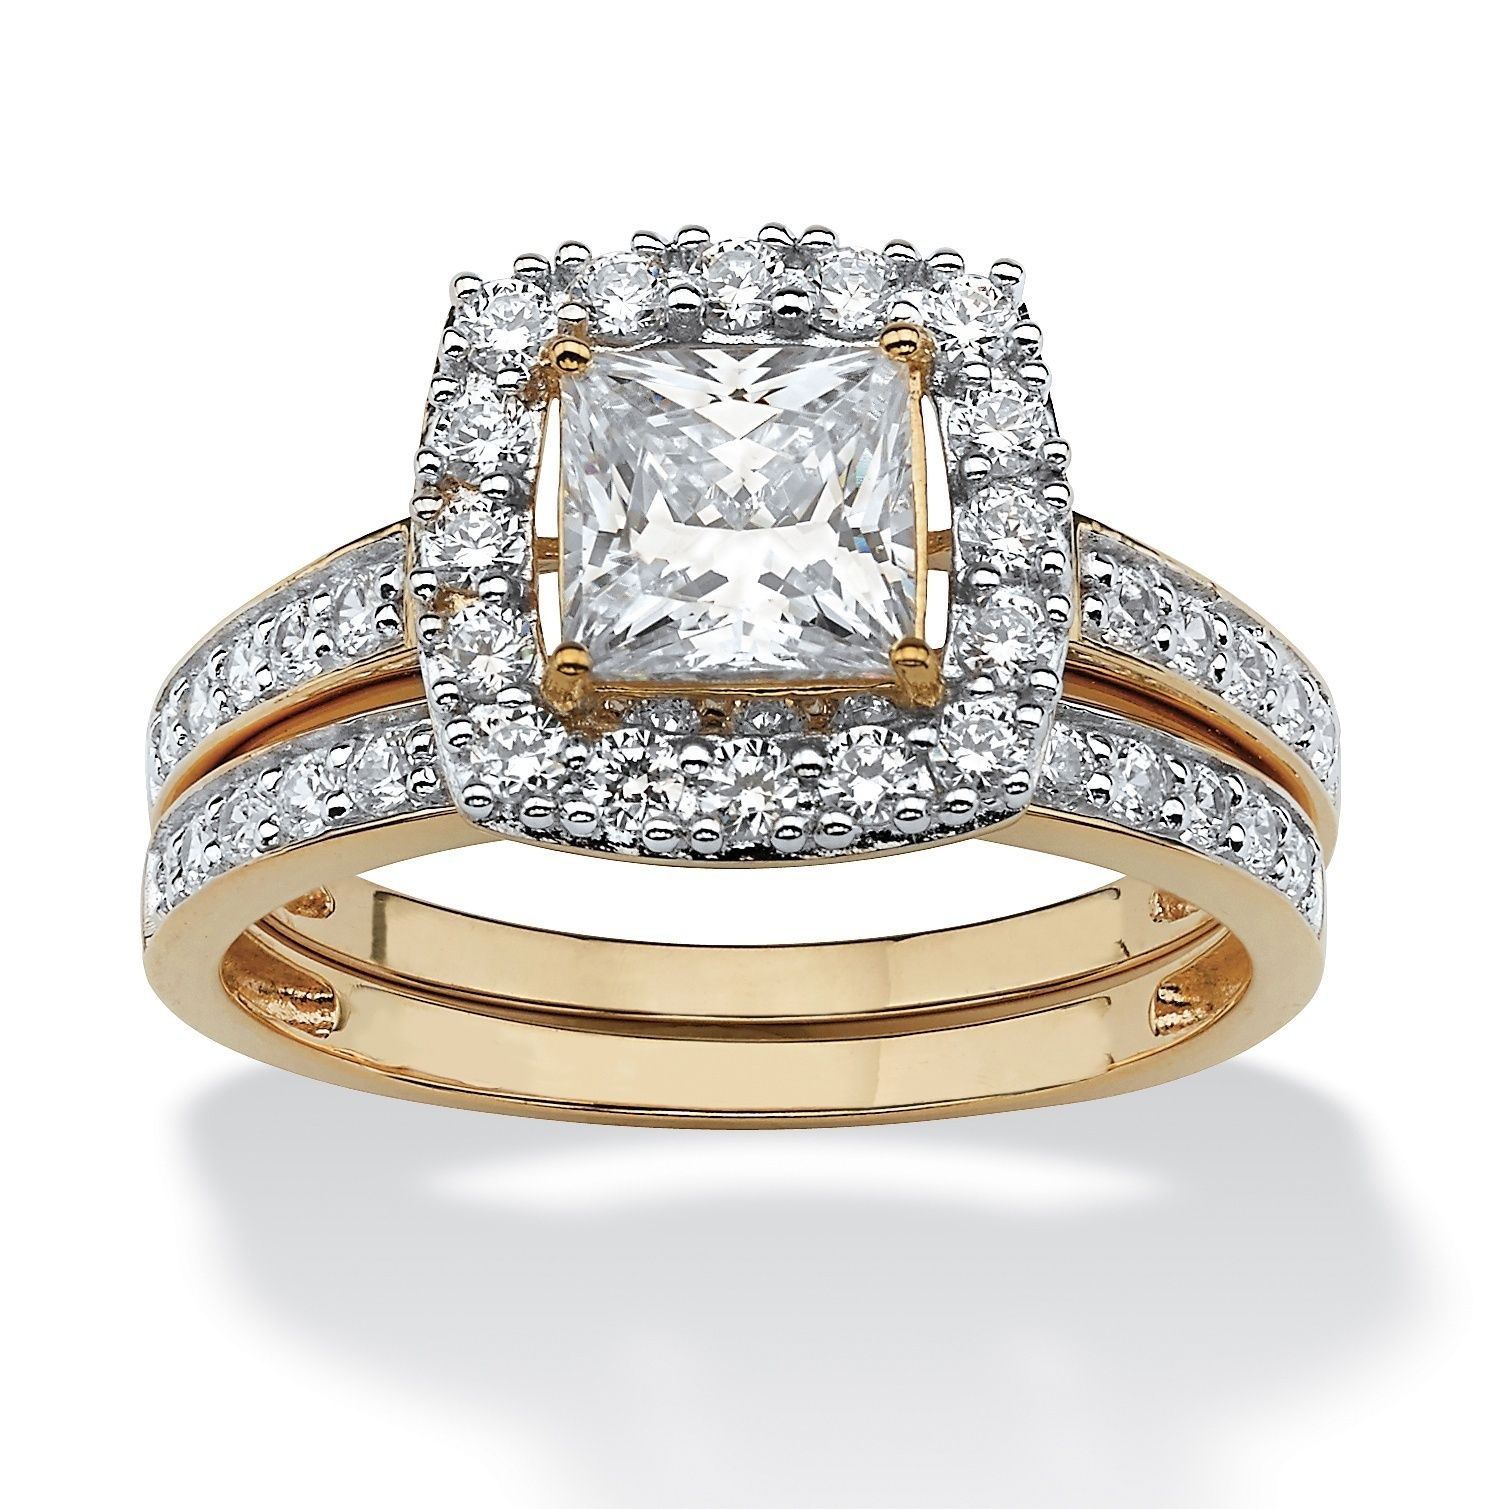 10K Yellow Gold Cubic Zirconia Halo Bridal Ring Set